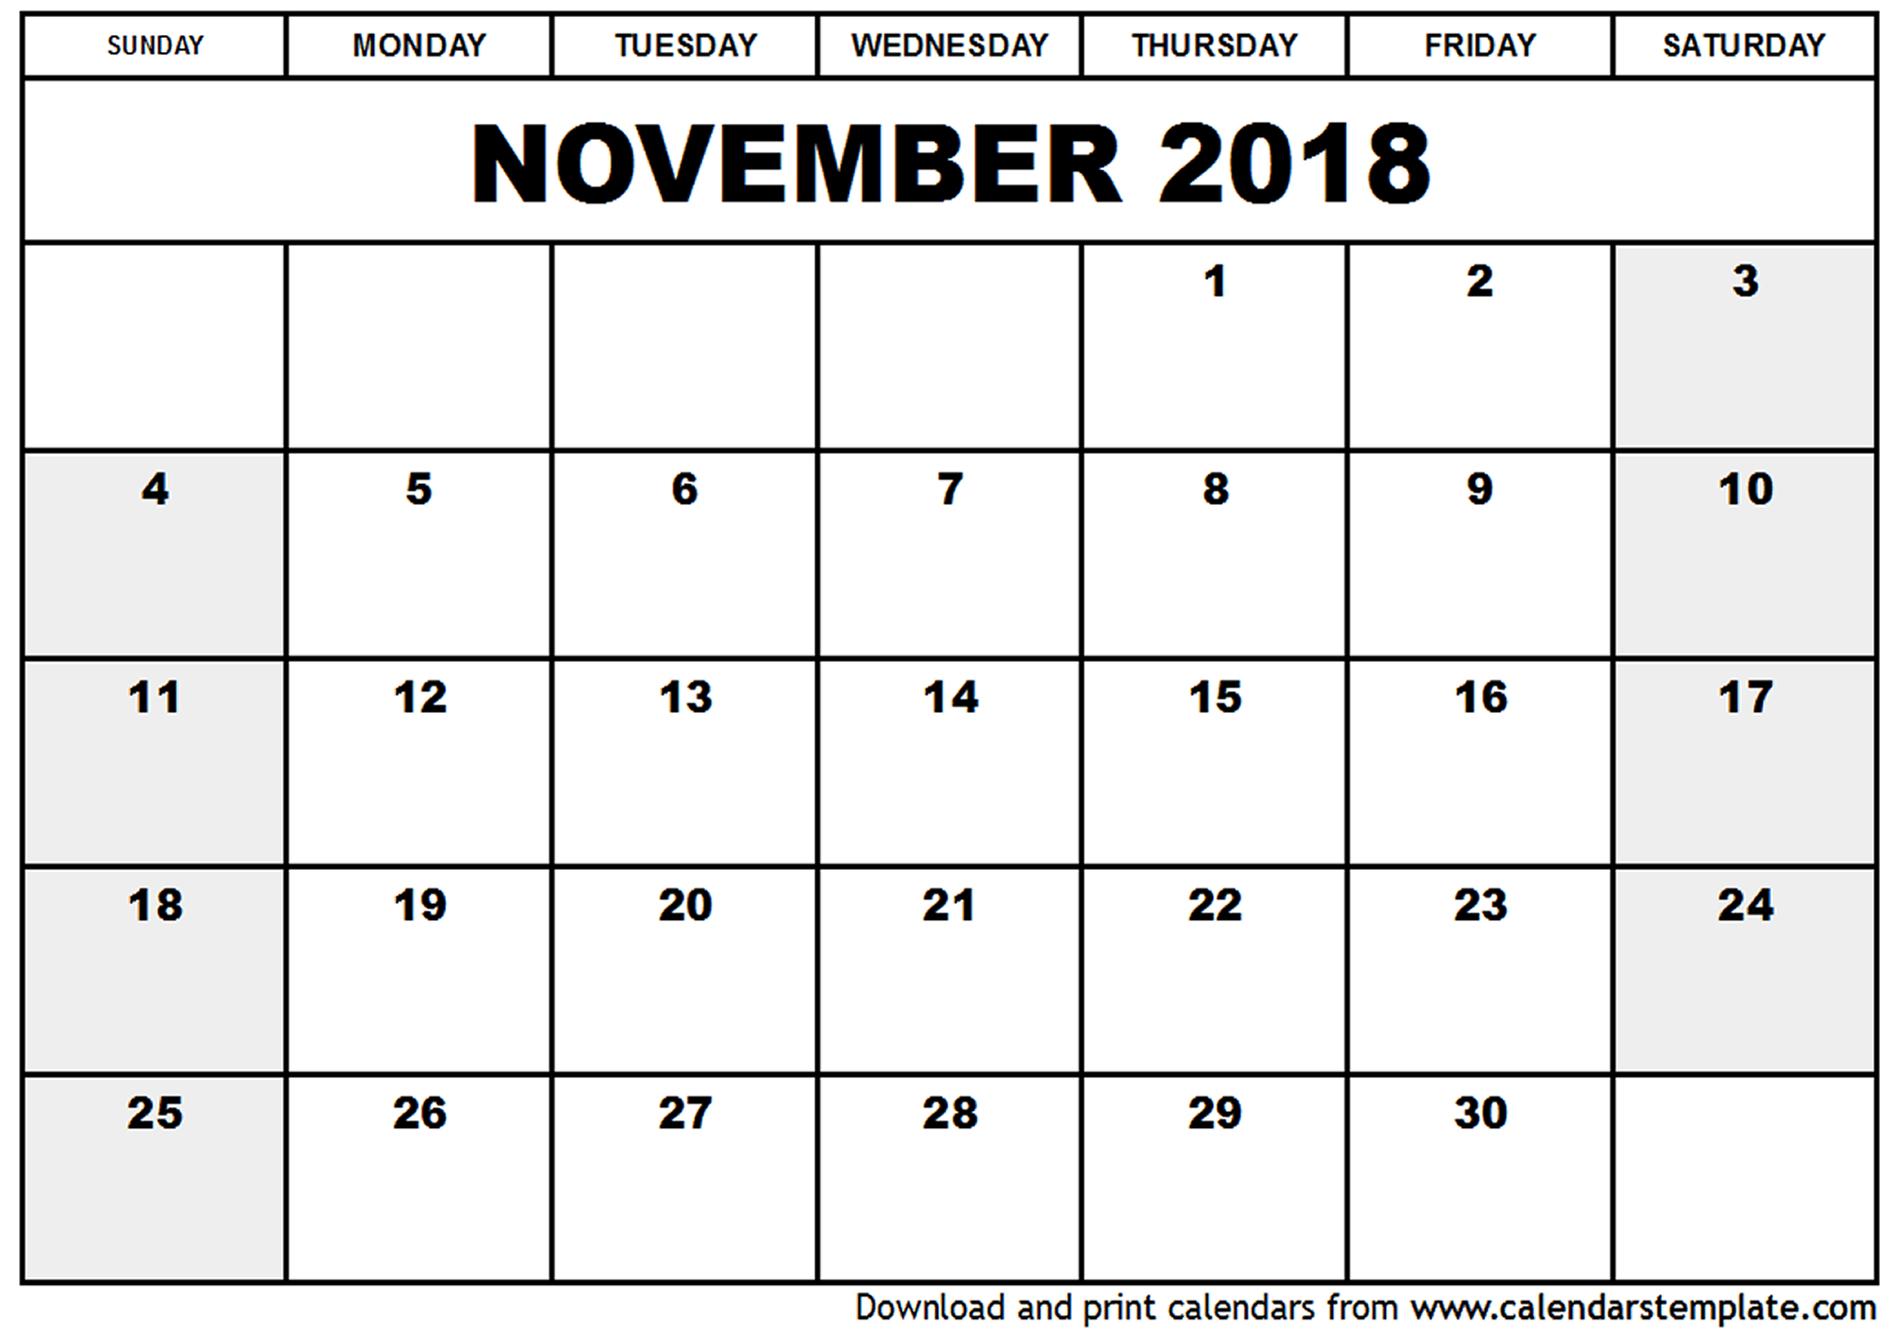 November 2018 Printable Calendar | Calendar For 2019